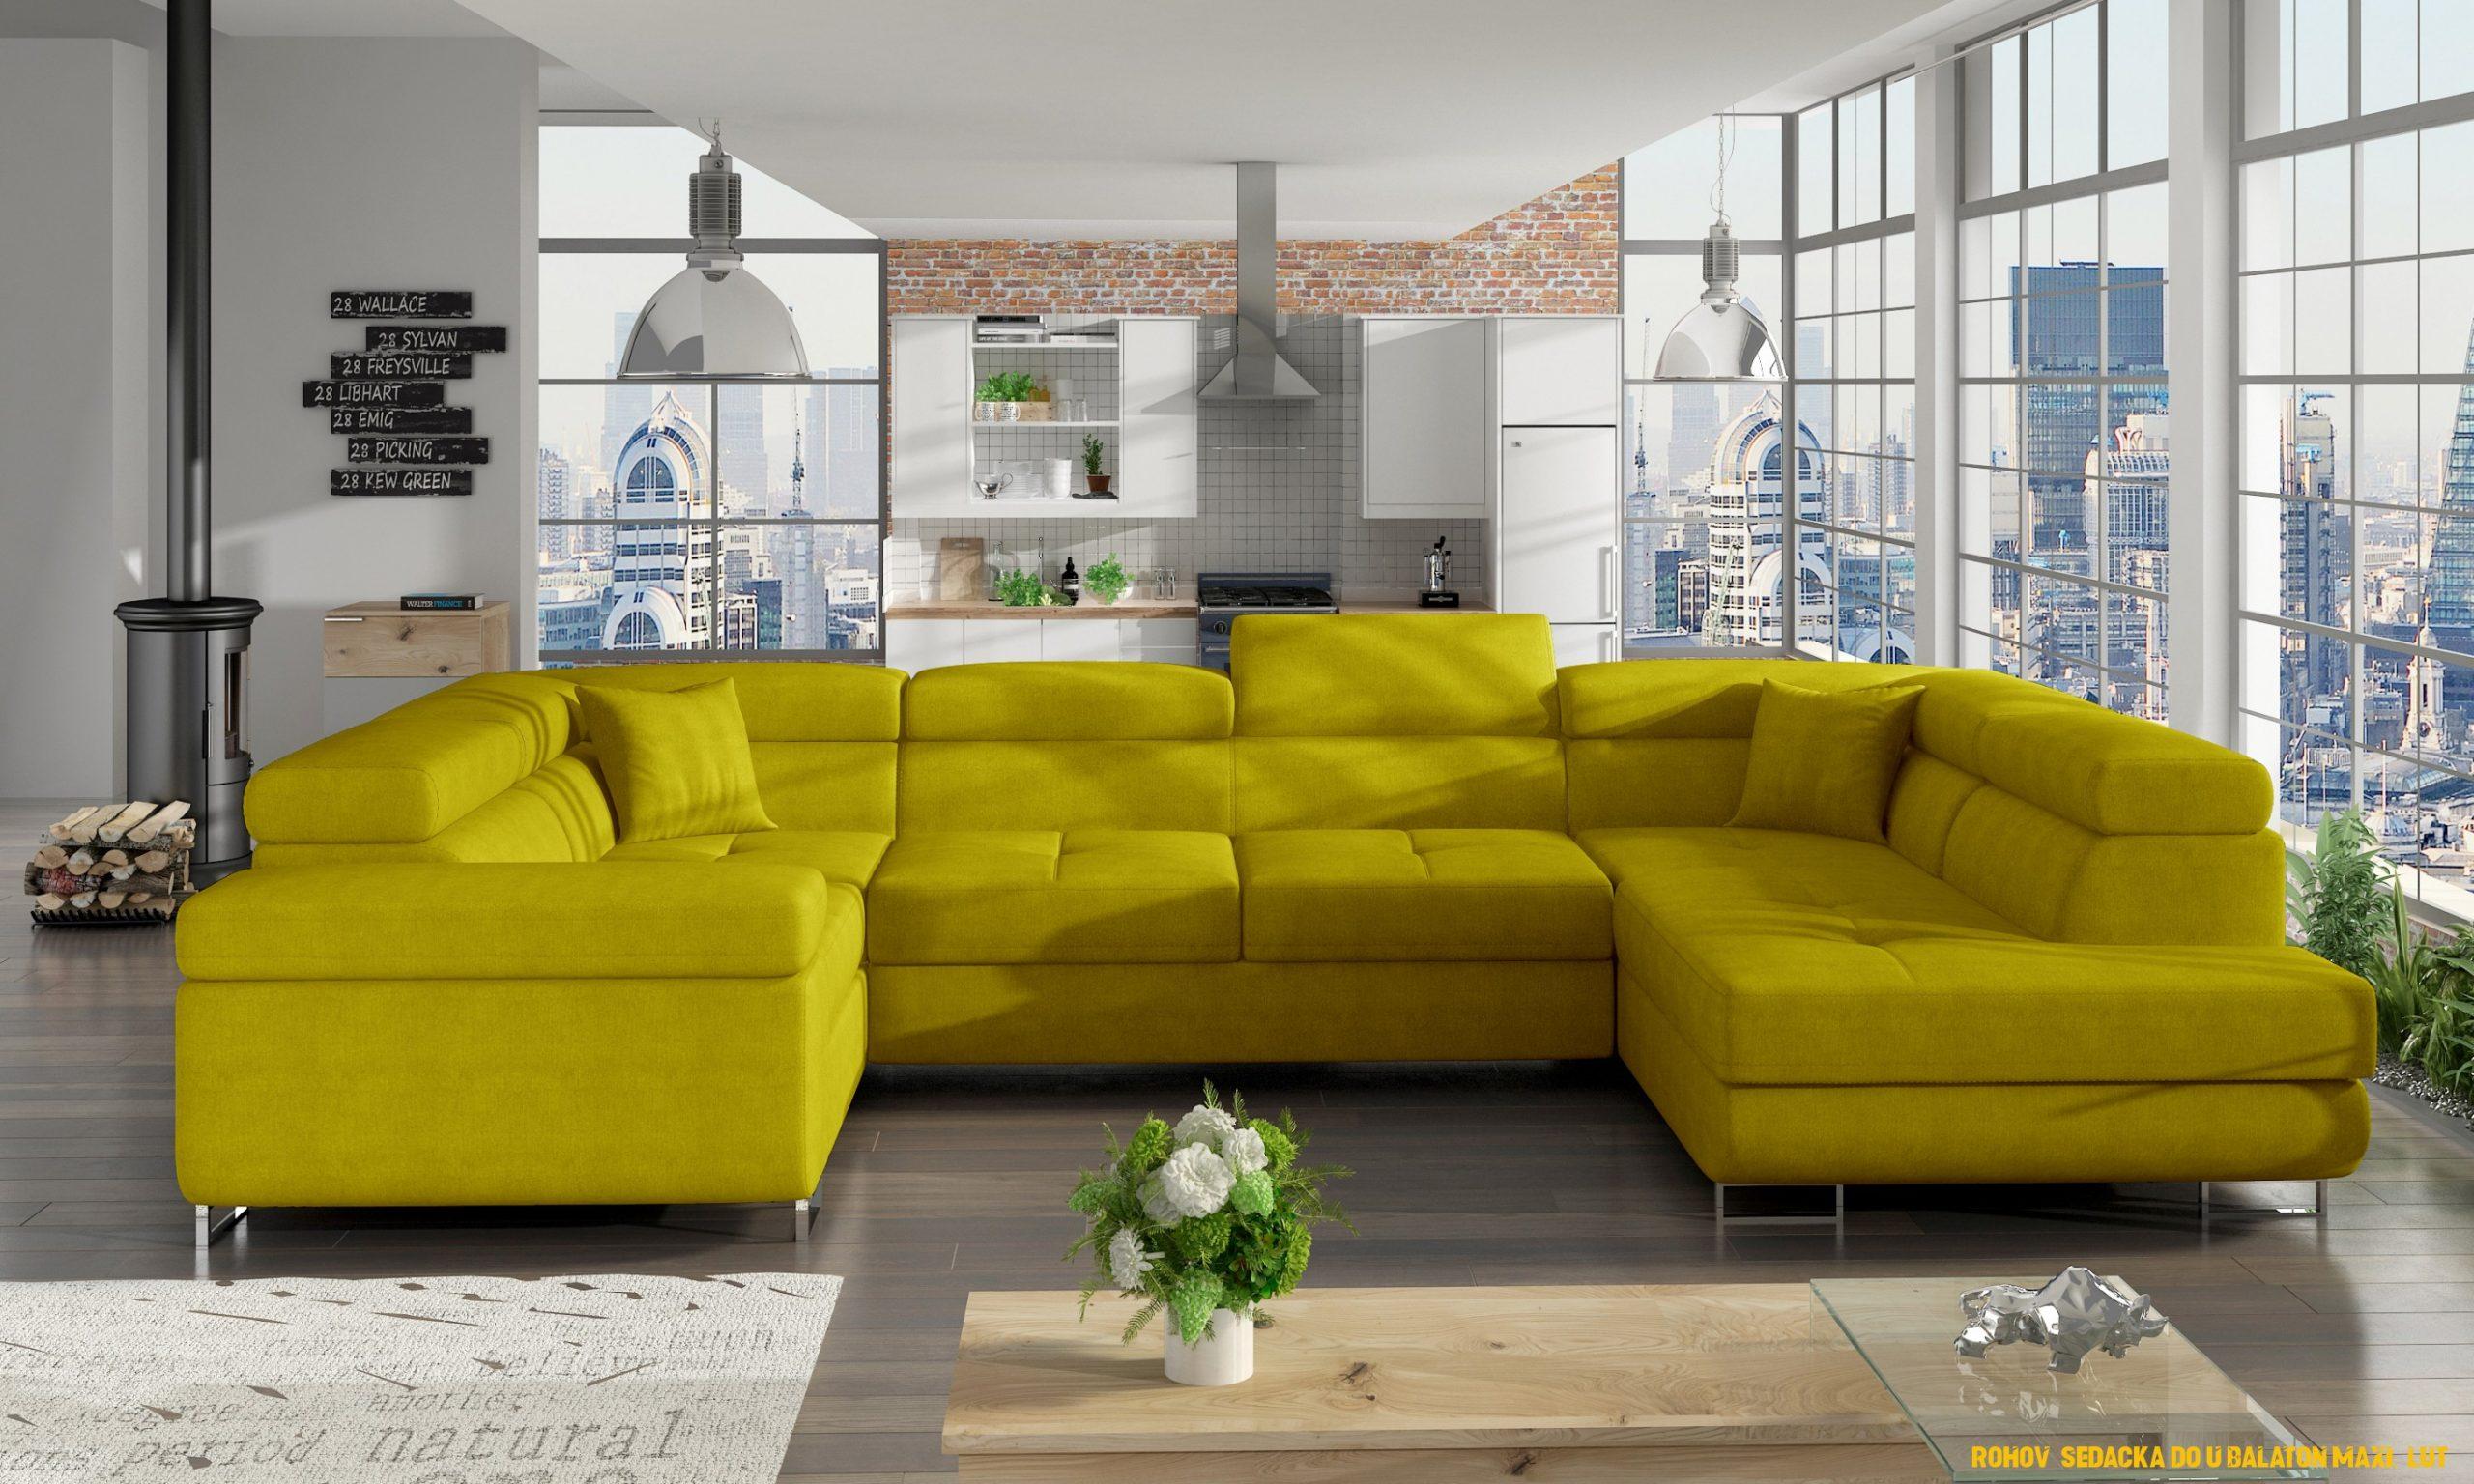 Rohová sedacka do U Balaton maxi, žlutá